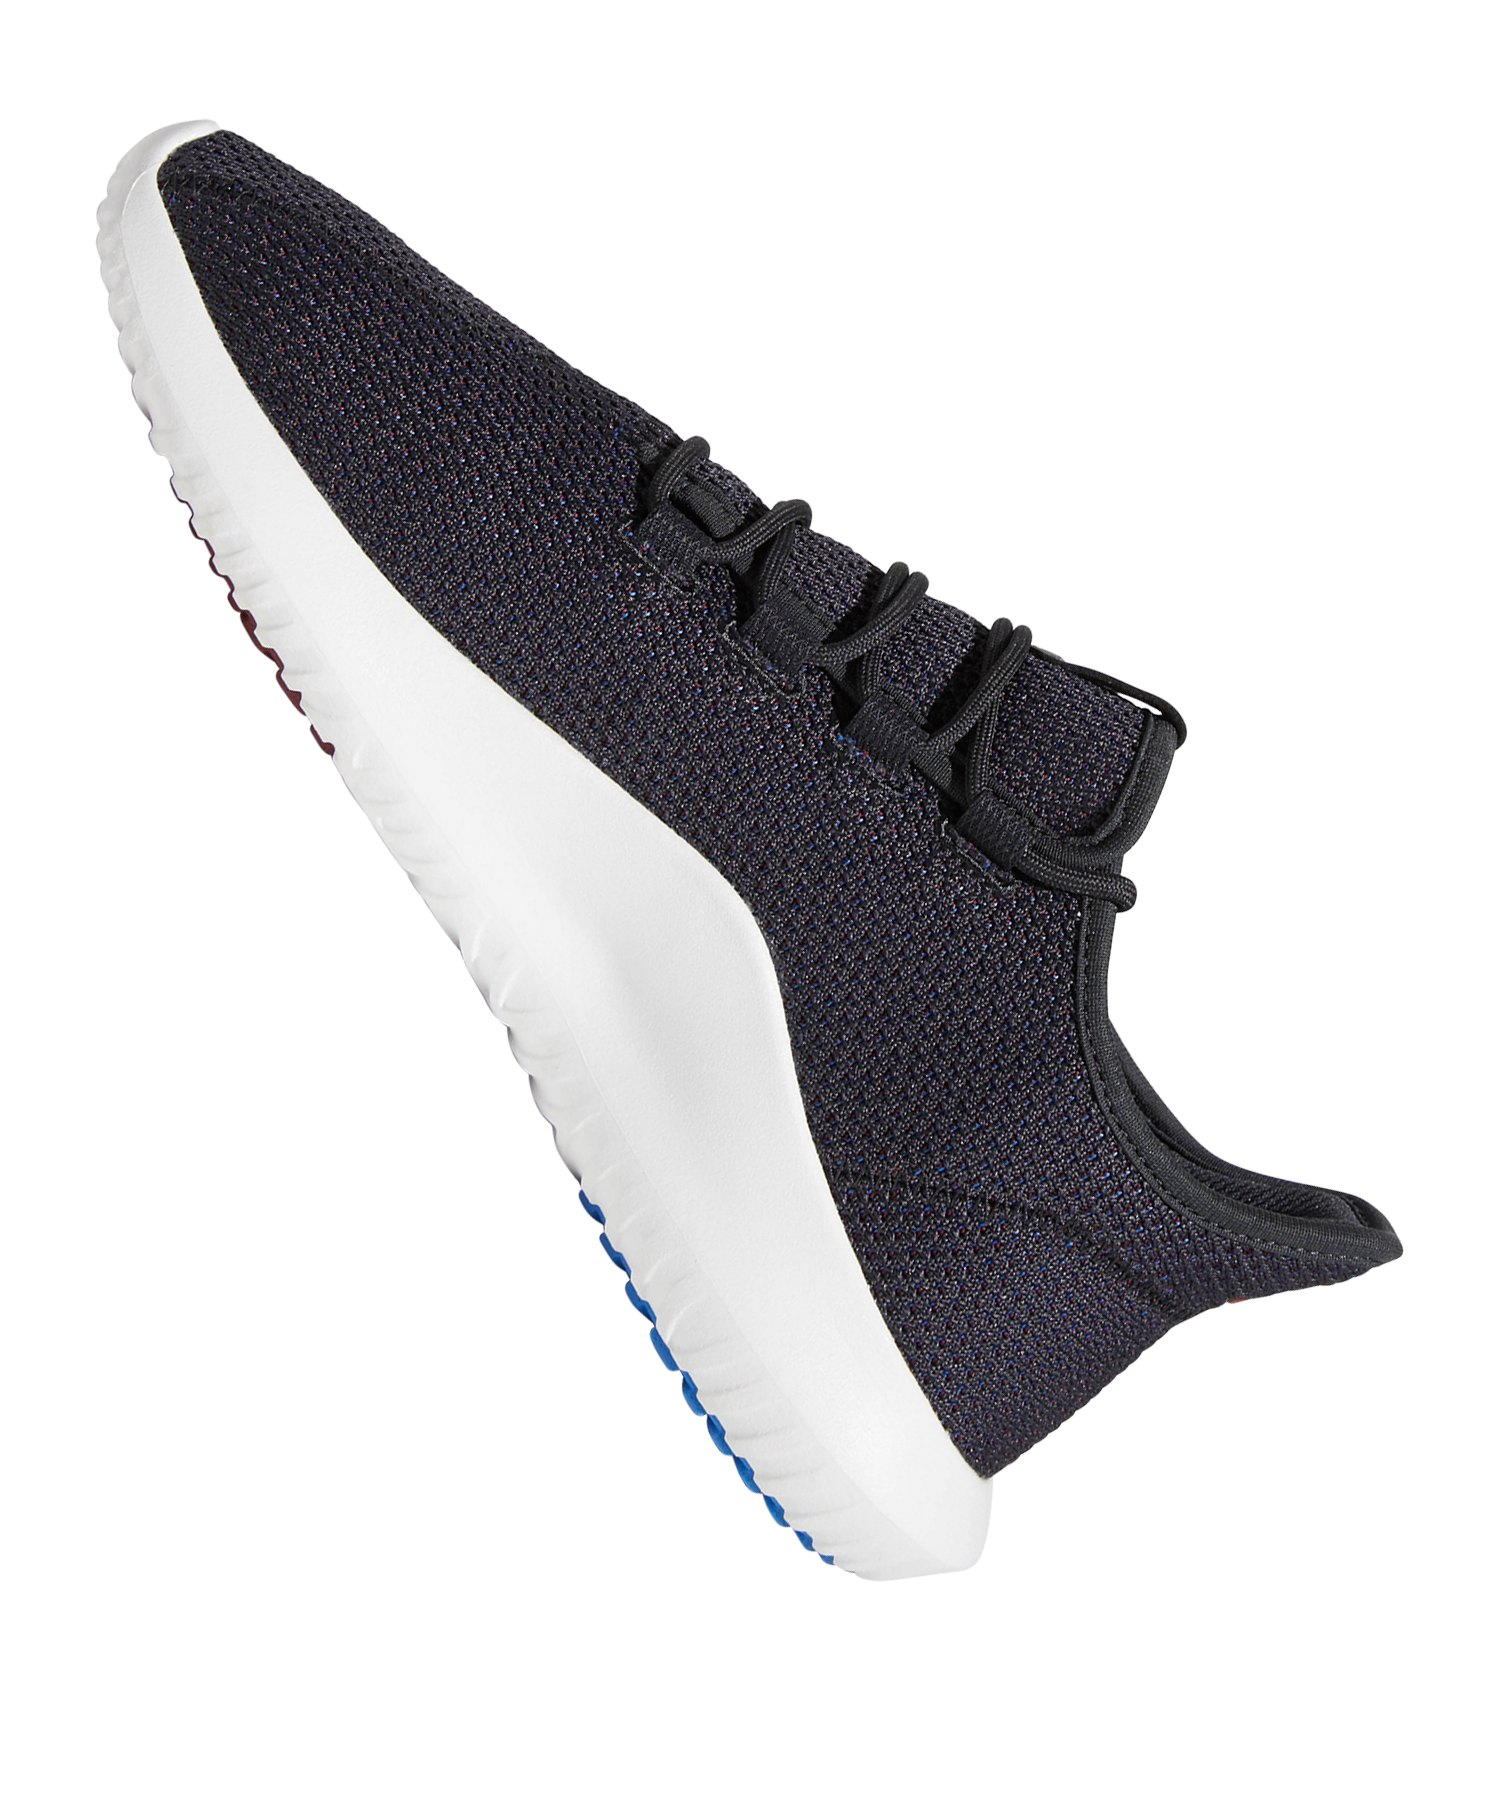 Adidas Originals Adidas Originals Shadow Tubular Tubular Schwarz YWDeE9bH2I